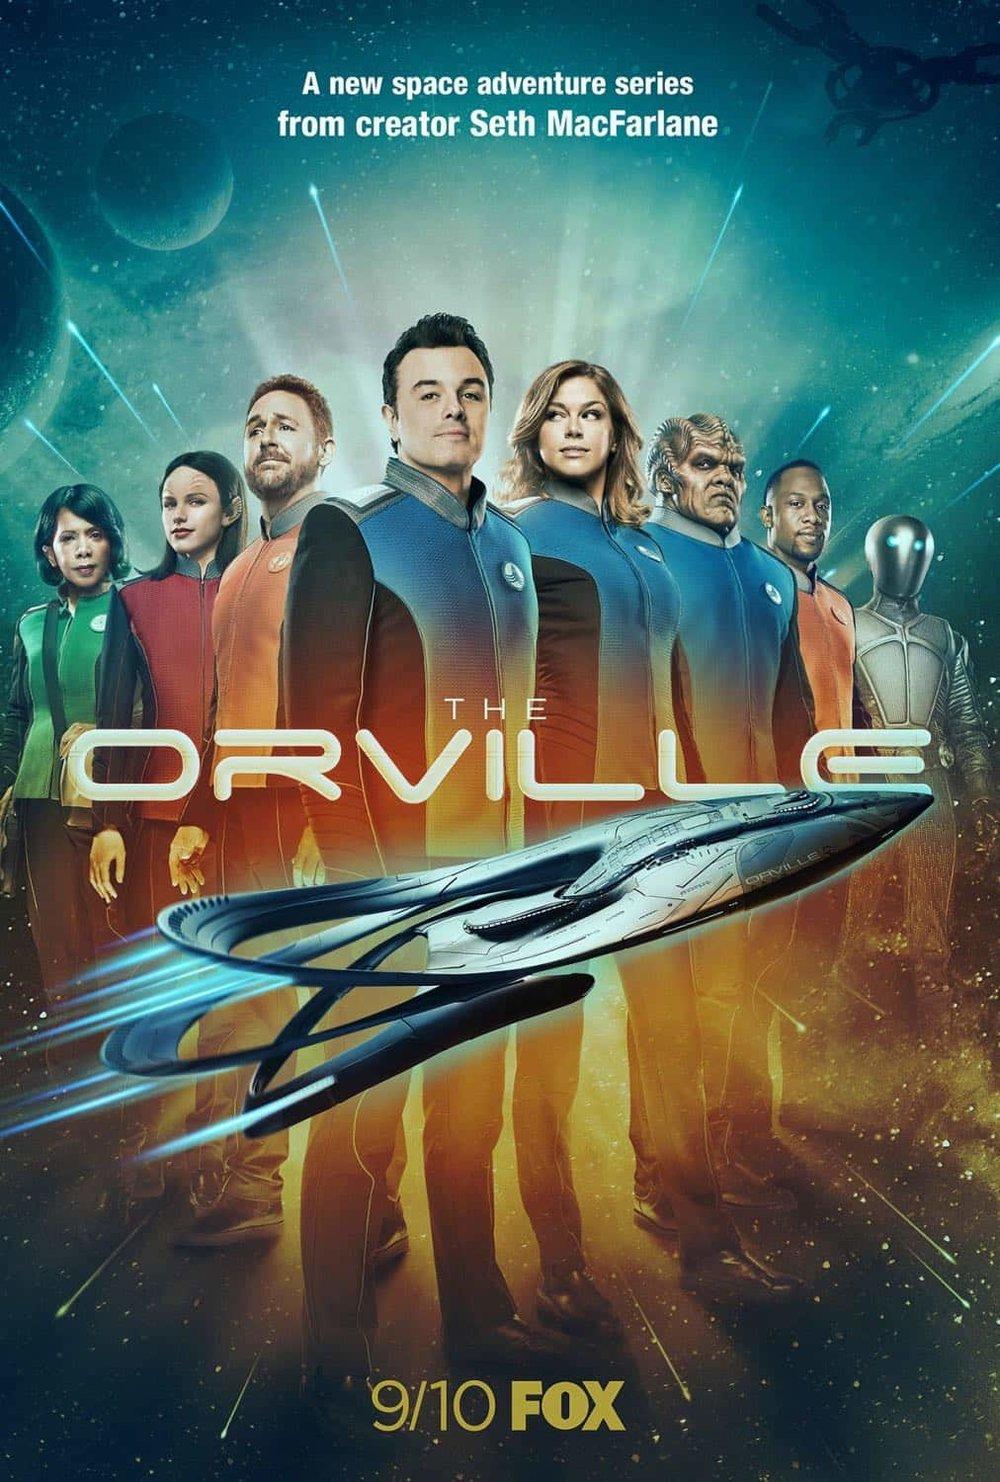 The Orville - Season 2 - Head of CG & CG Supervisor @ PIXOMONDO Vancouver